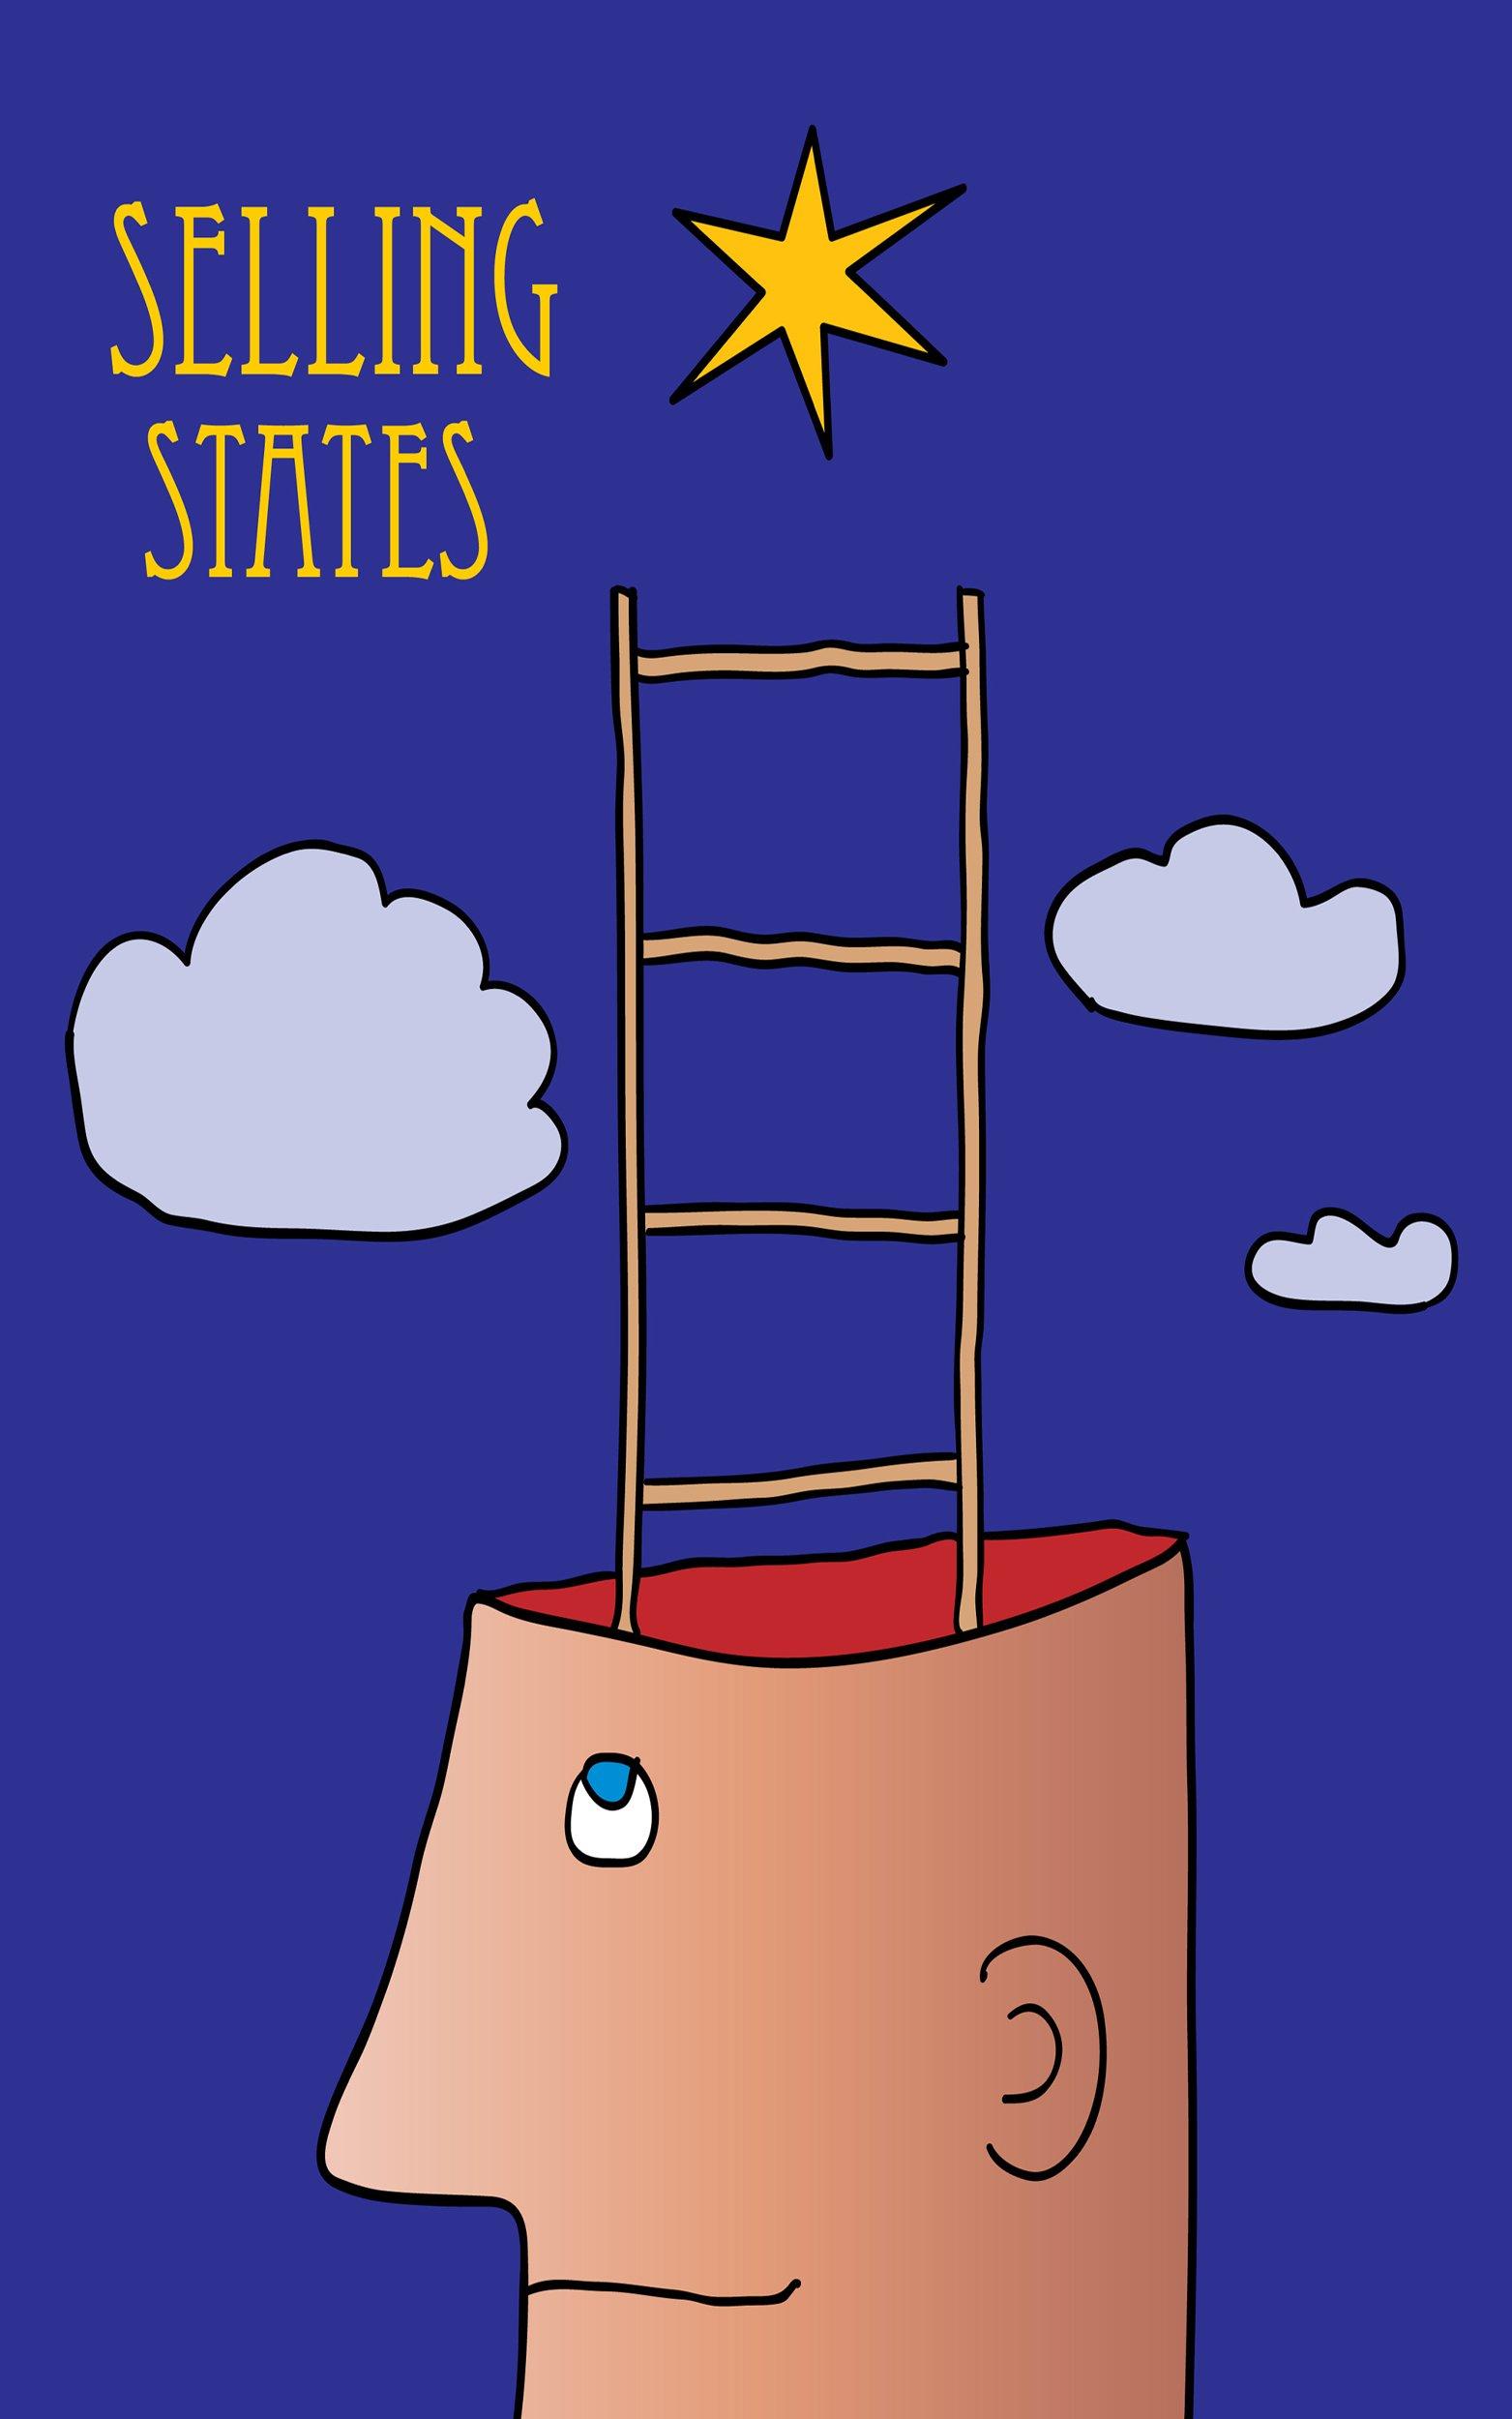 Selling States